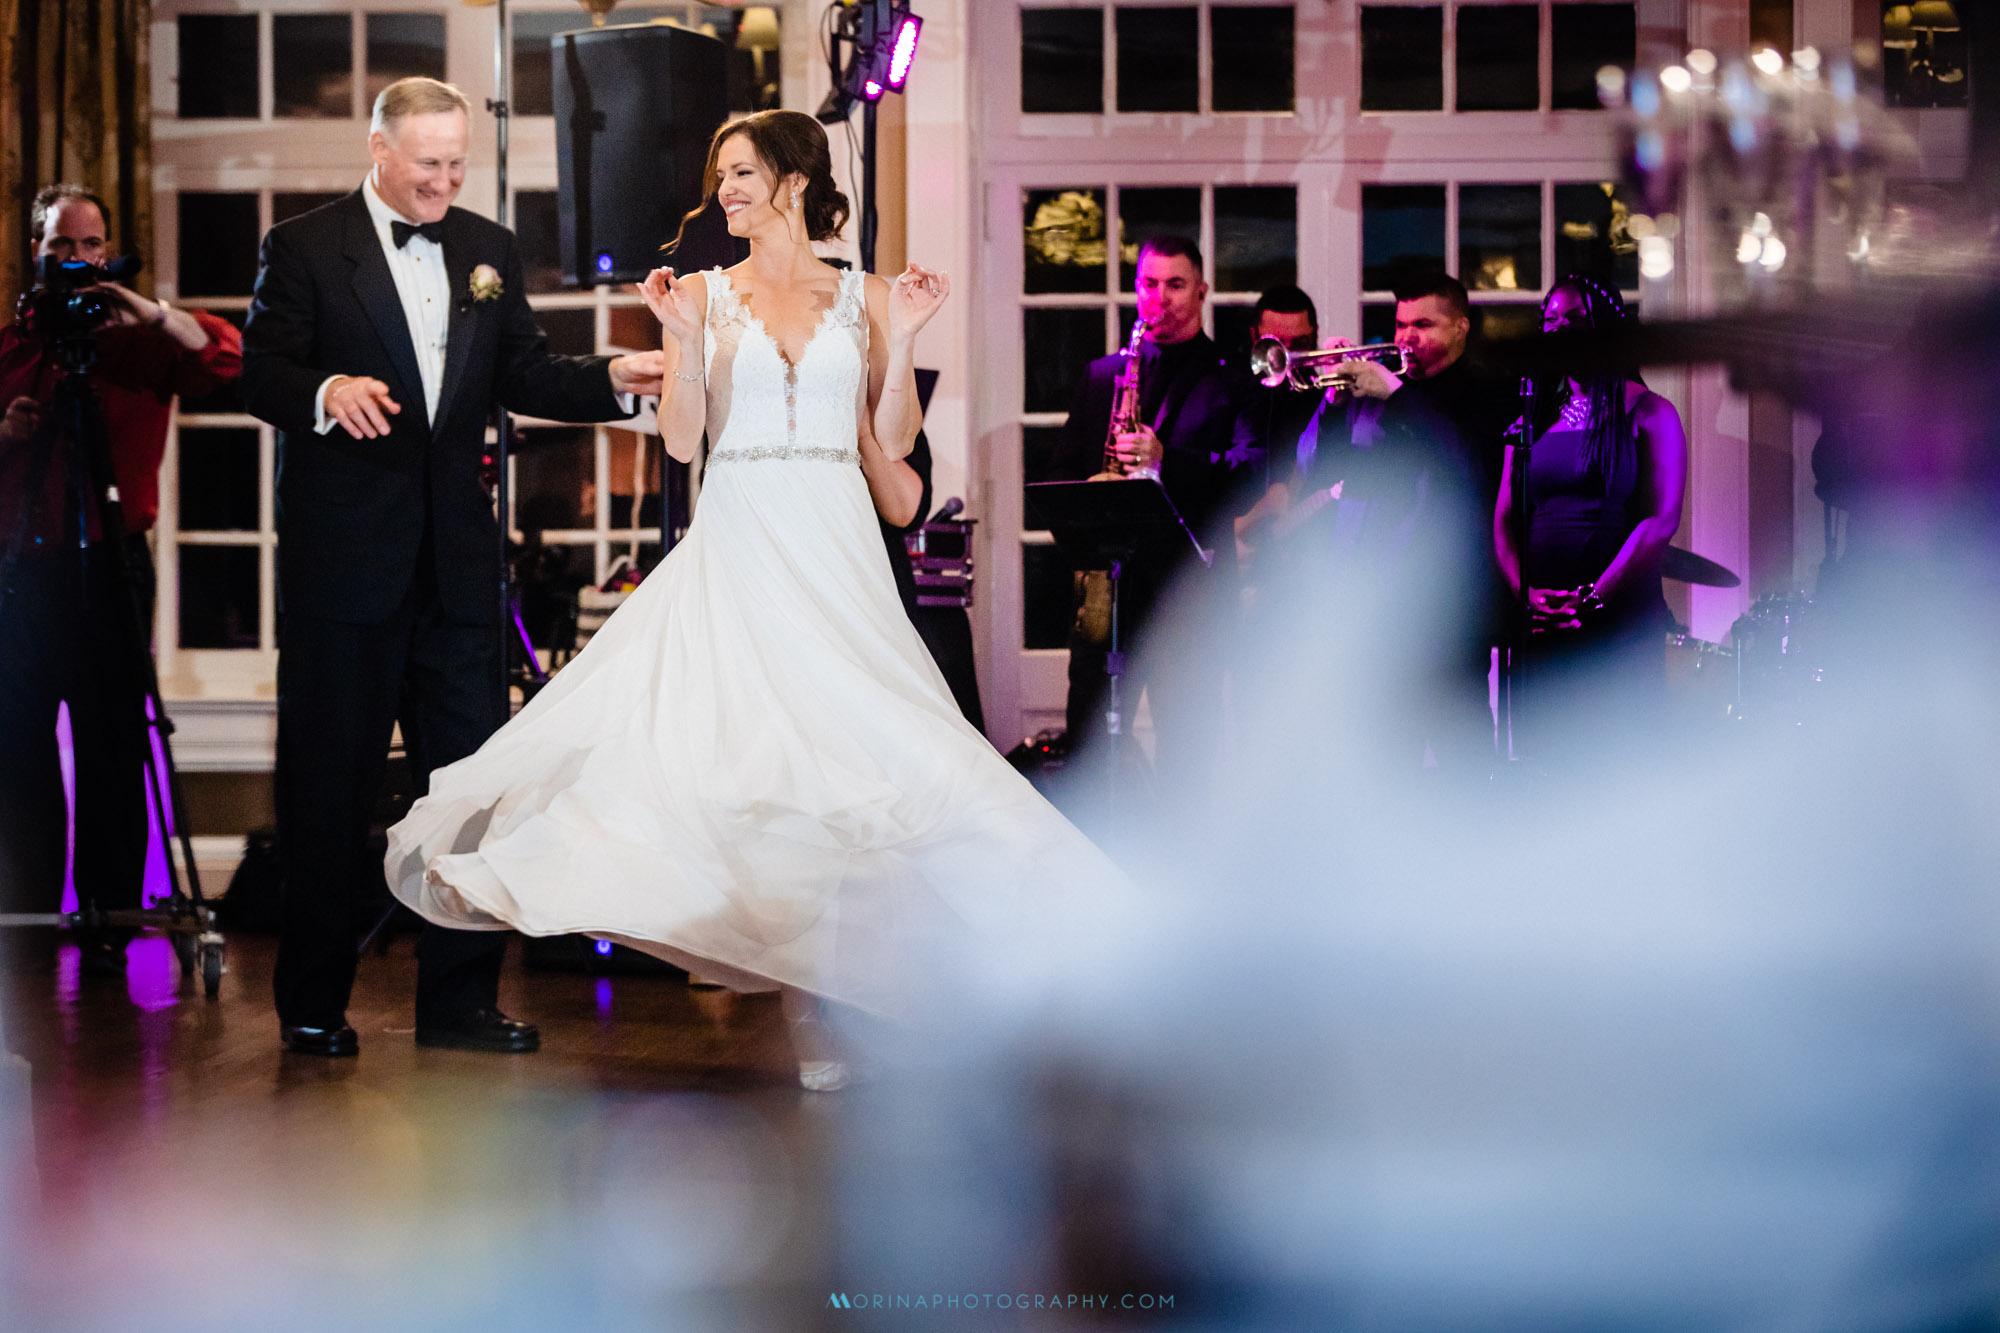 Colleen & Bill Wedding at Manufacturers' Golf & Country Club wedding 0074.jpg